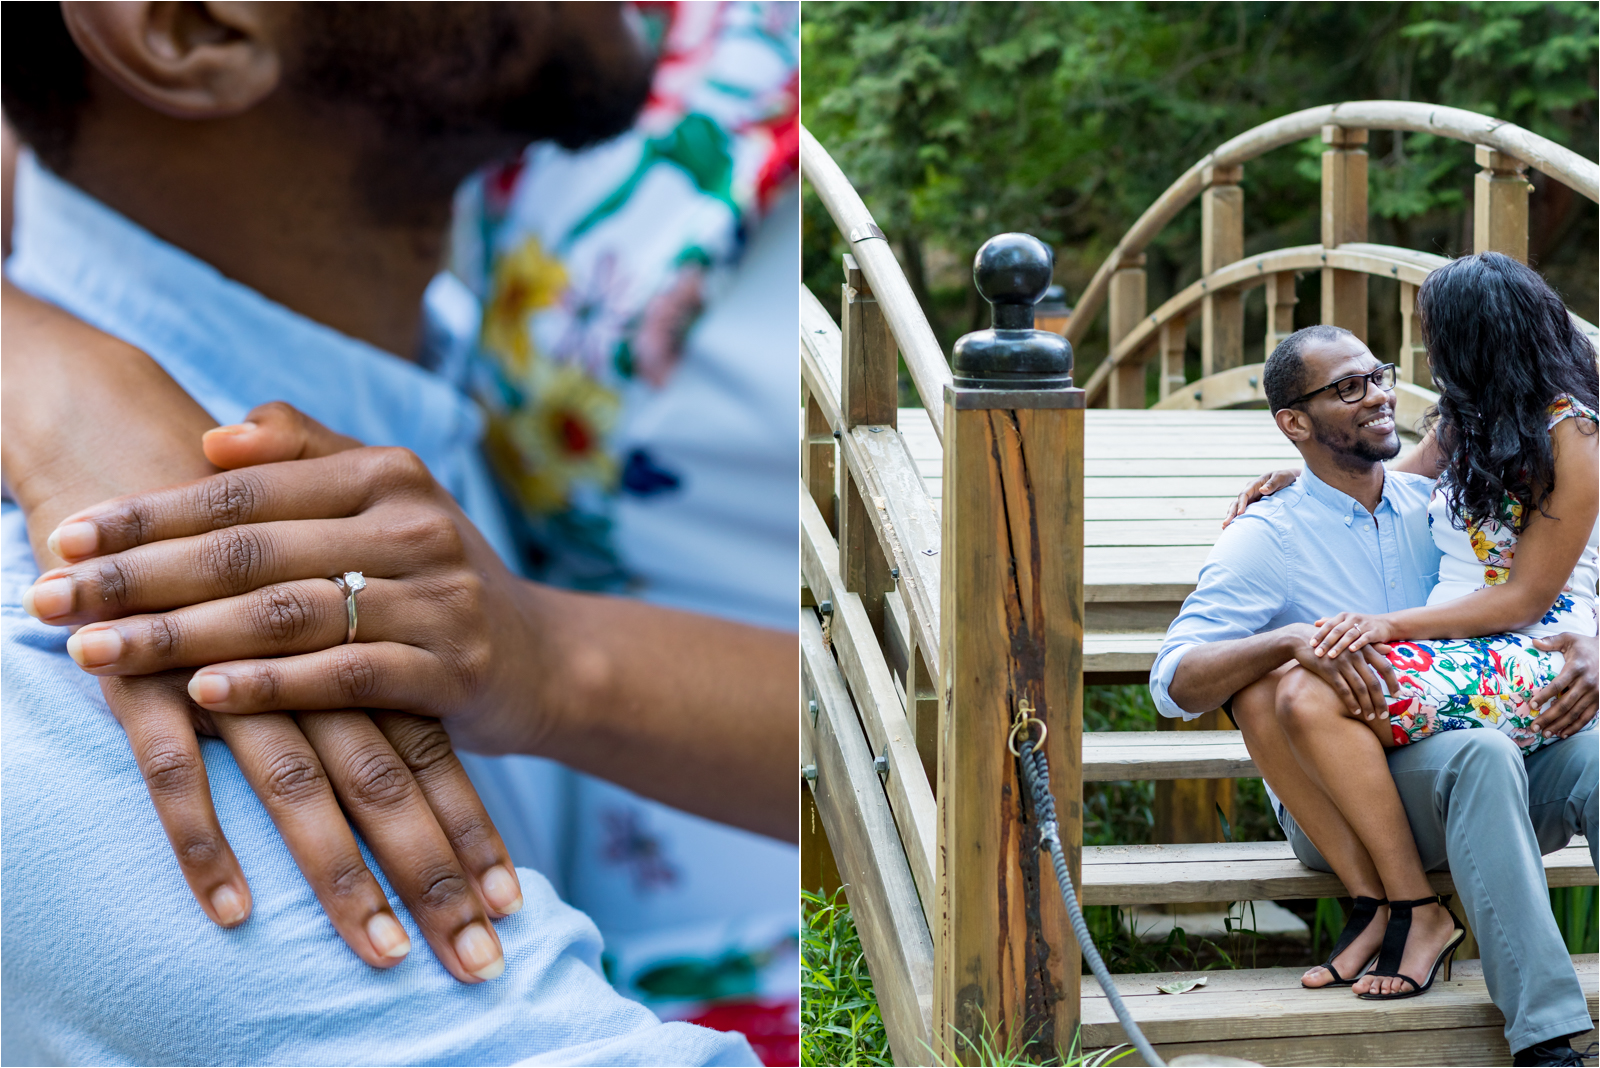 japanese-gardens-japanesegardens-engagement-images-maymont-park-italian-japanese-gardens-richmond-virginia-rva-va-focus-on-joy-photography-african-american-couple-white-dress-colorful-flowers-blue-polo-shirt-richmond-bridge